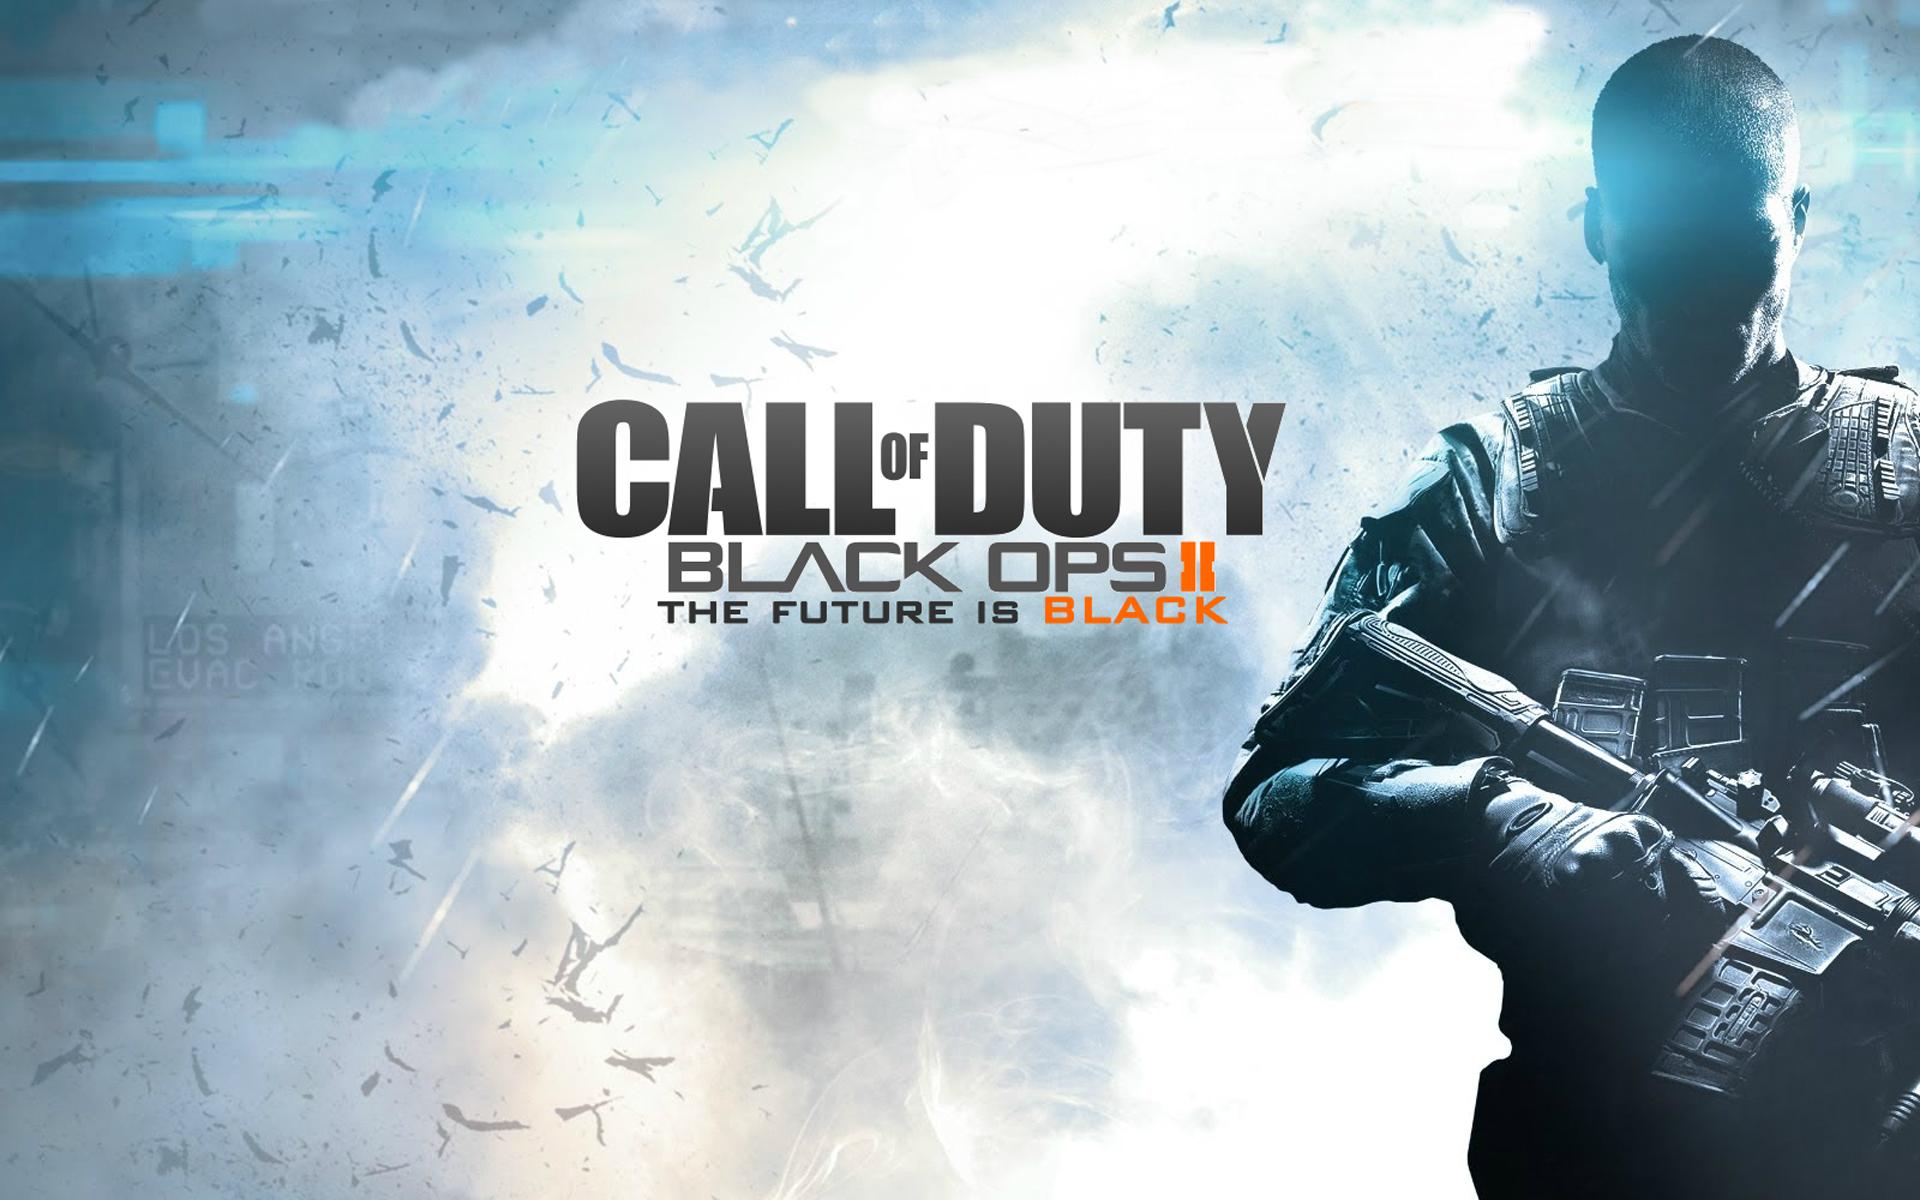 Multiplayer-ul din Call of Duty: Black Ops 2 dezvaluit [+VIDEO]